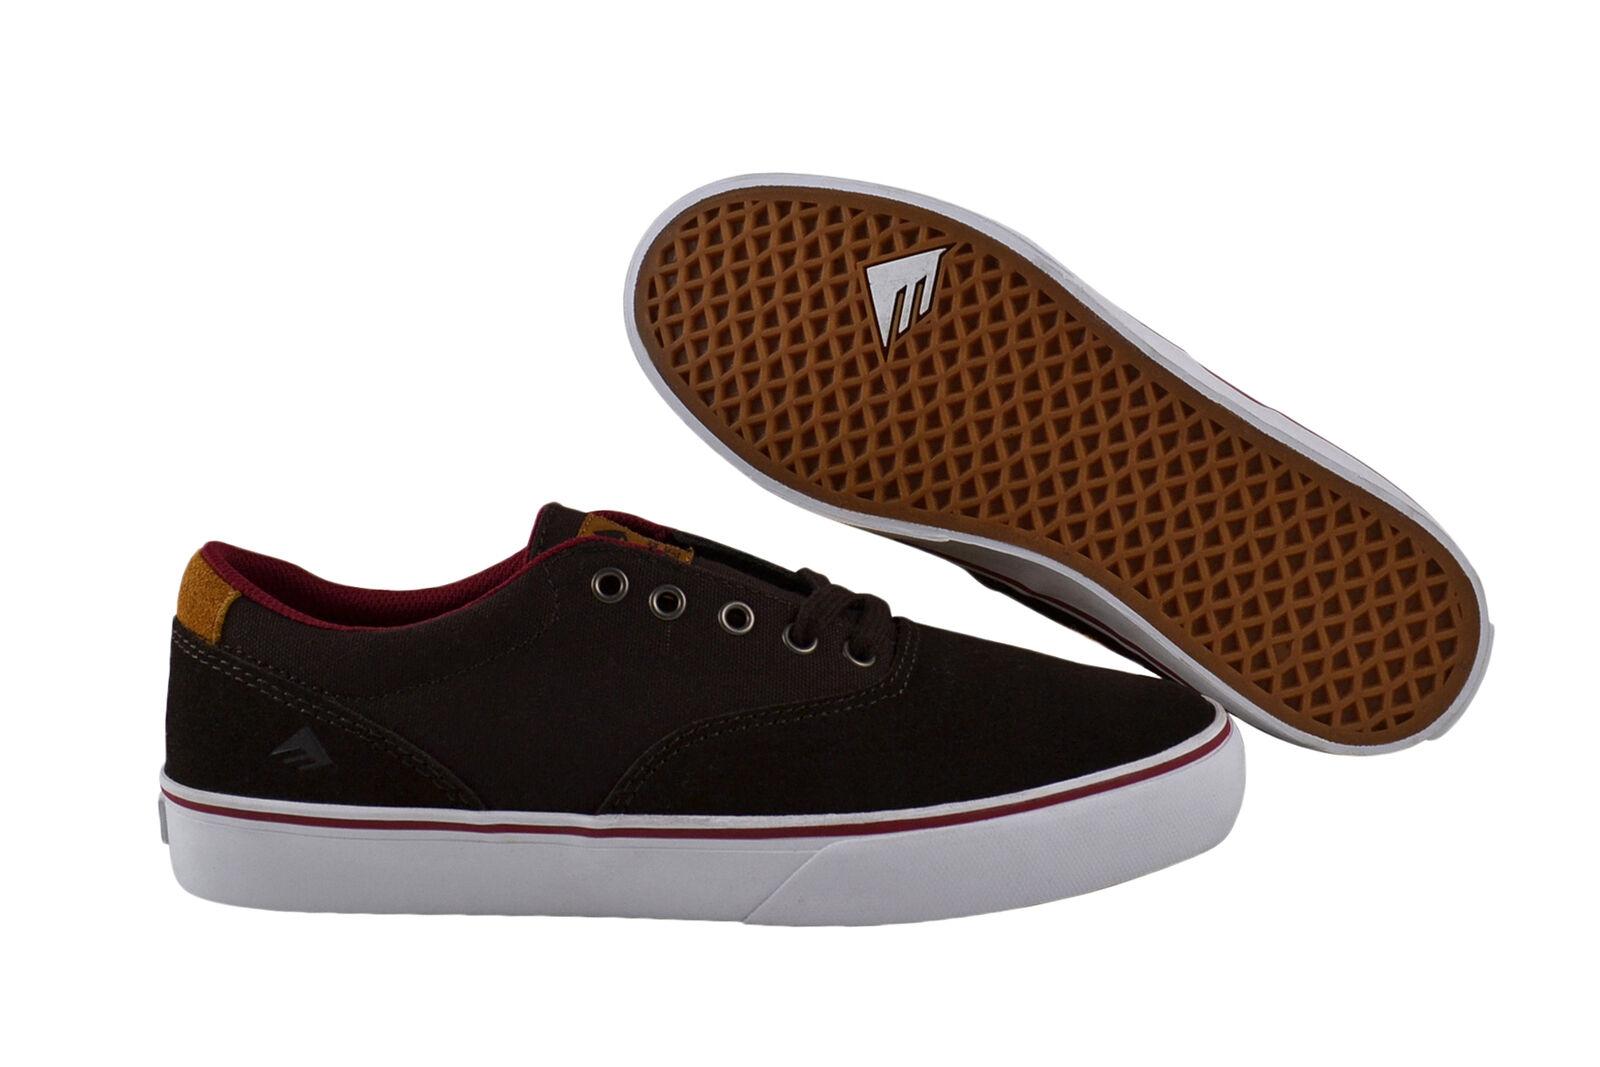 Emerica Provost Slim Vulc braun Weiß Turnschuhe Schuhe braun